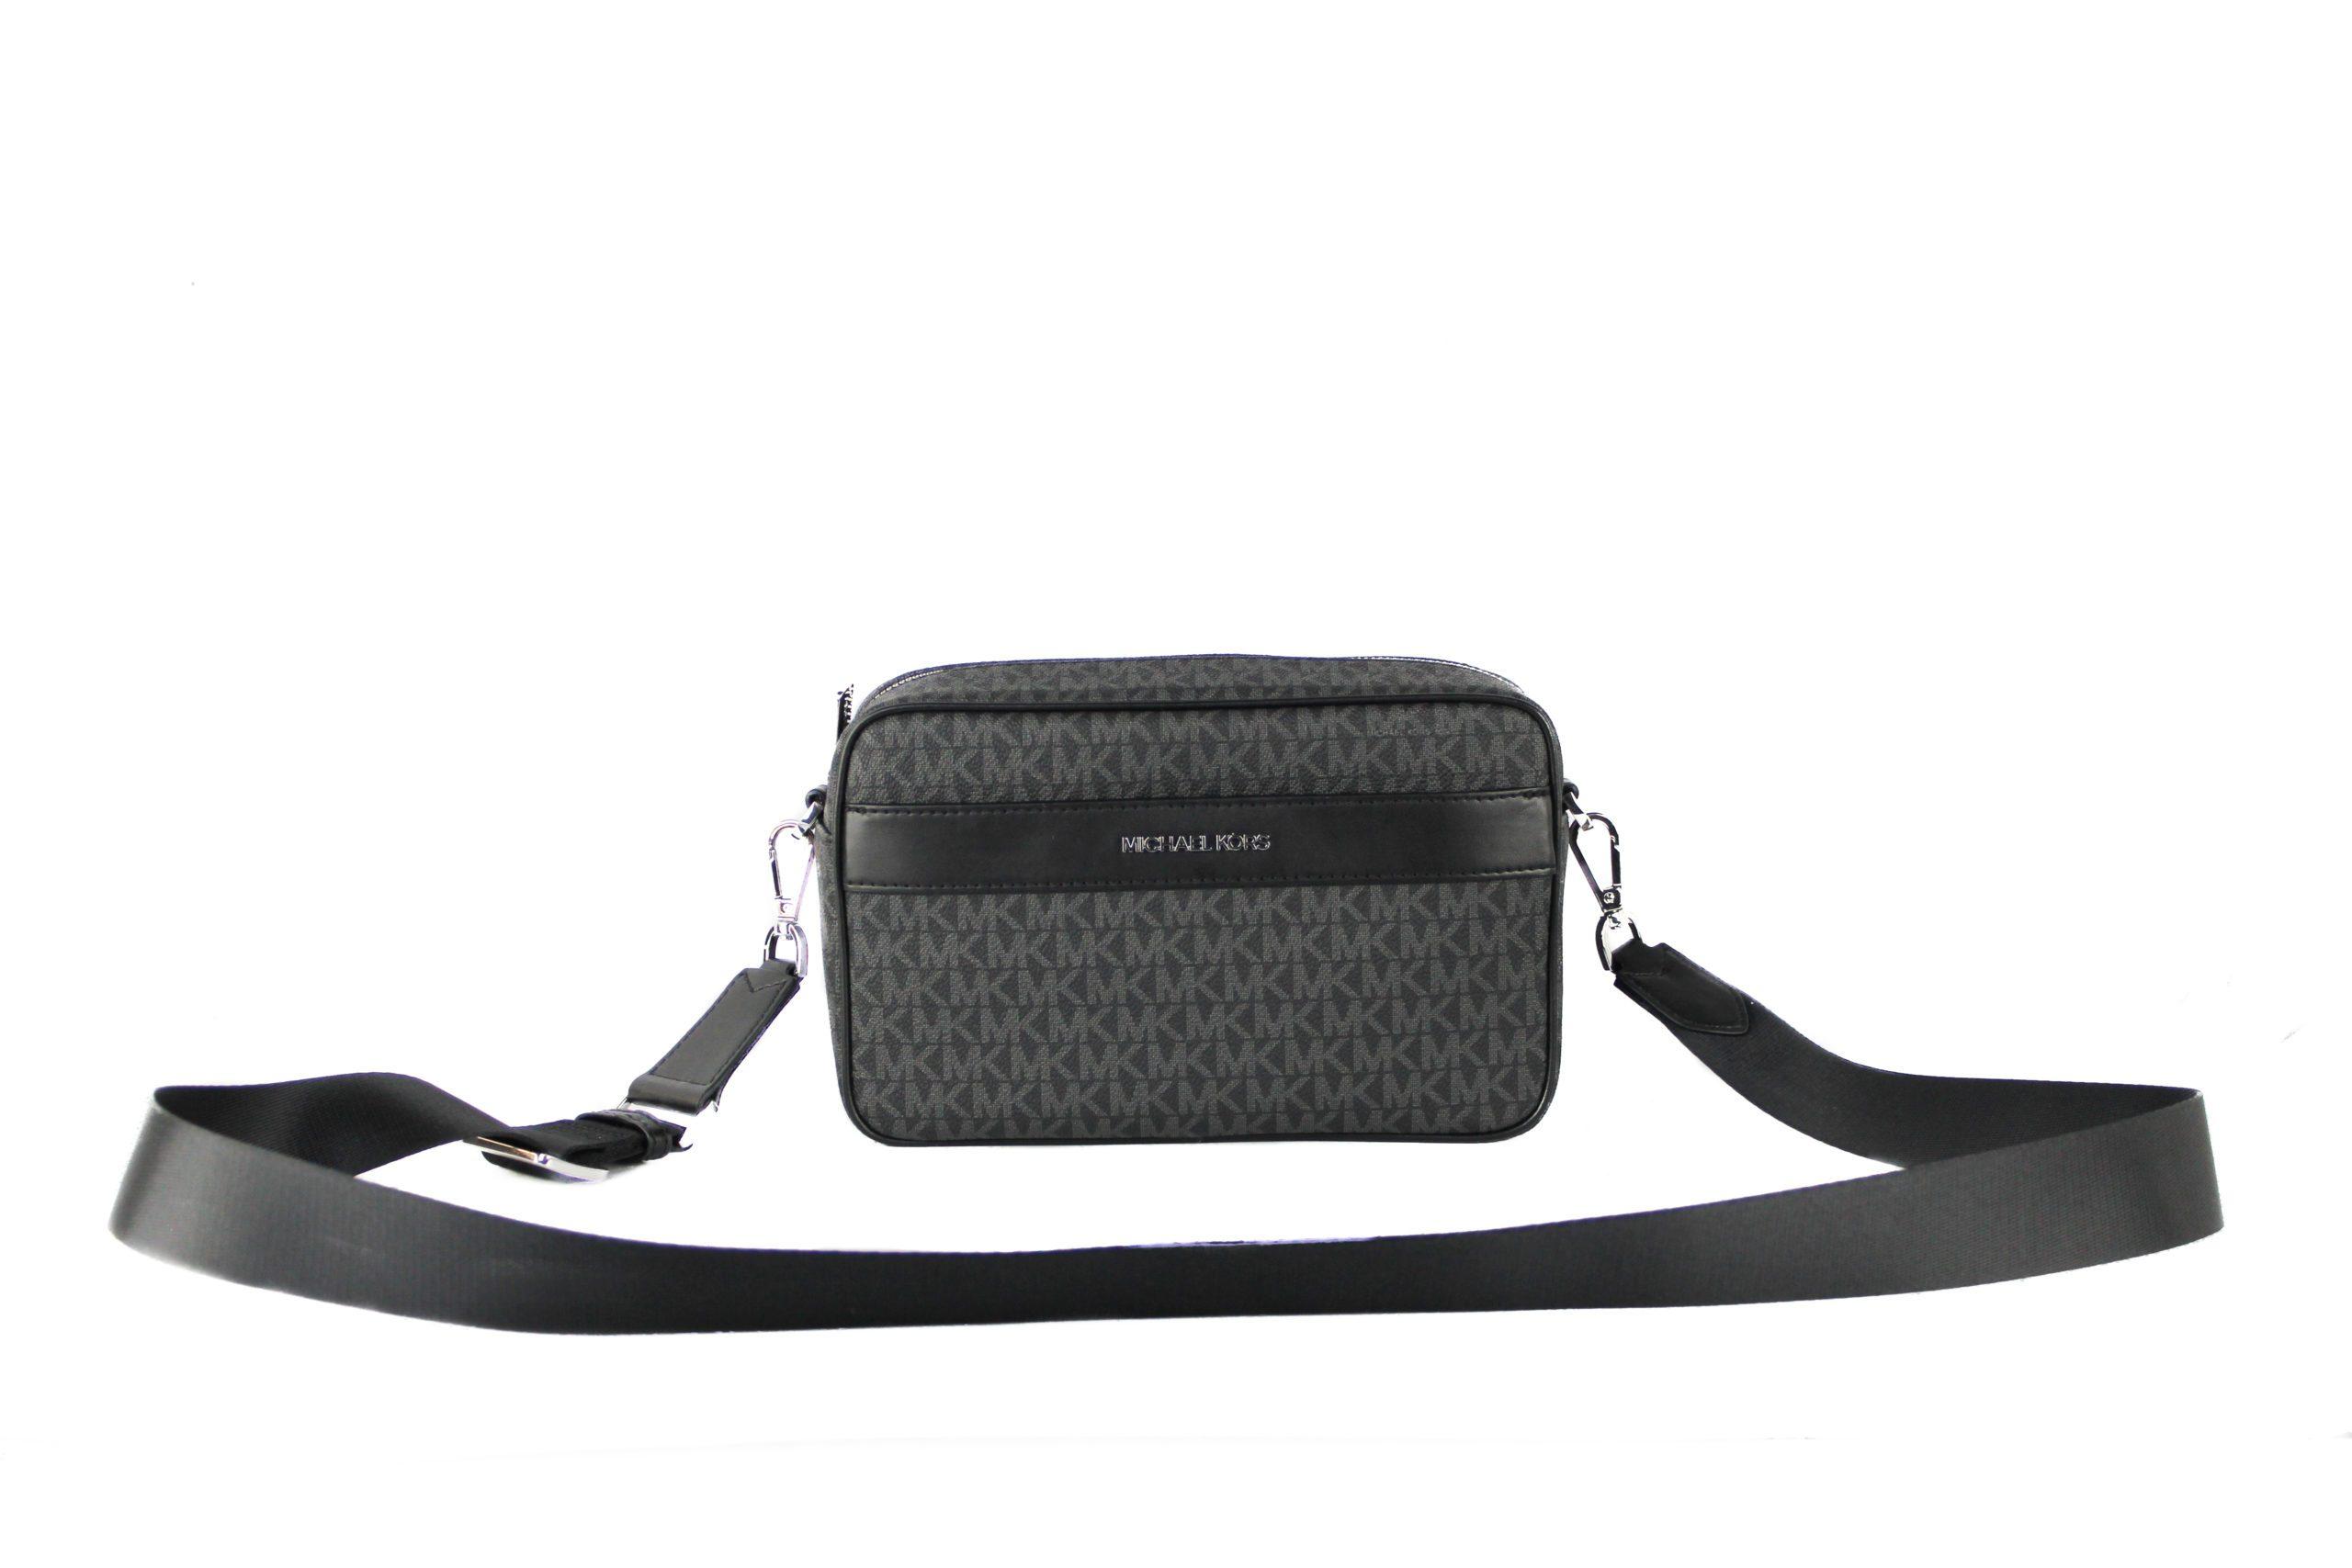 Michael Kors Women's Kenly Crossbody Bag Black 56431